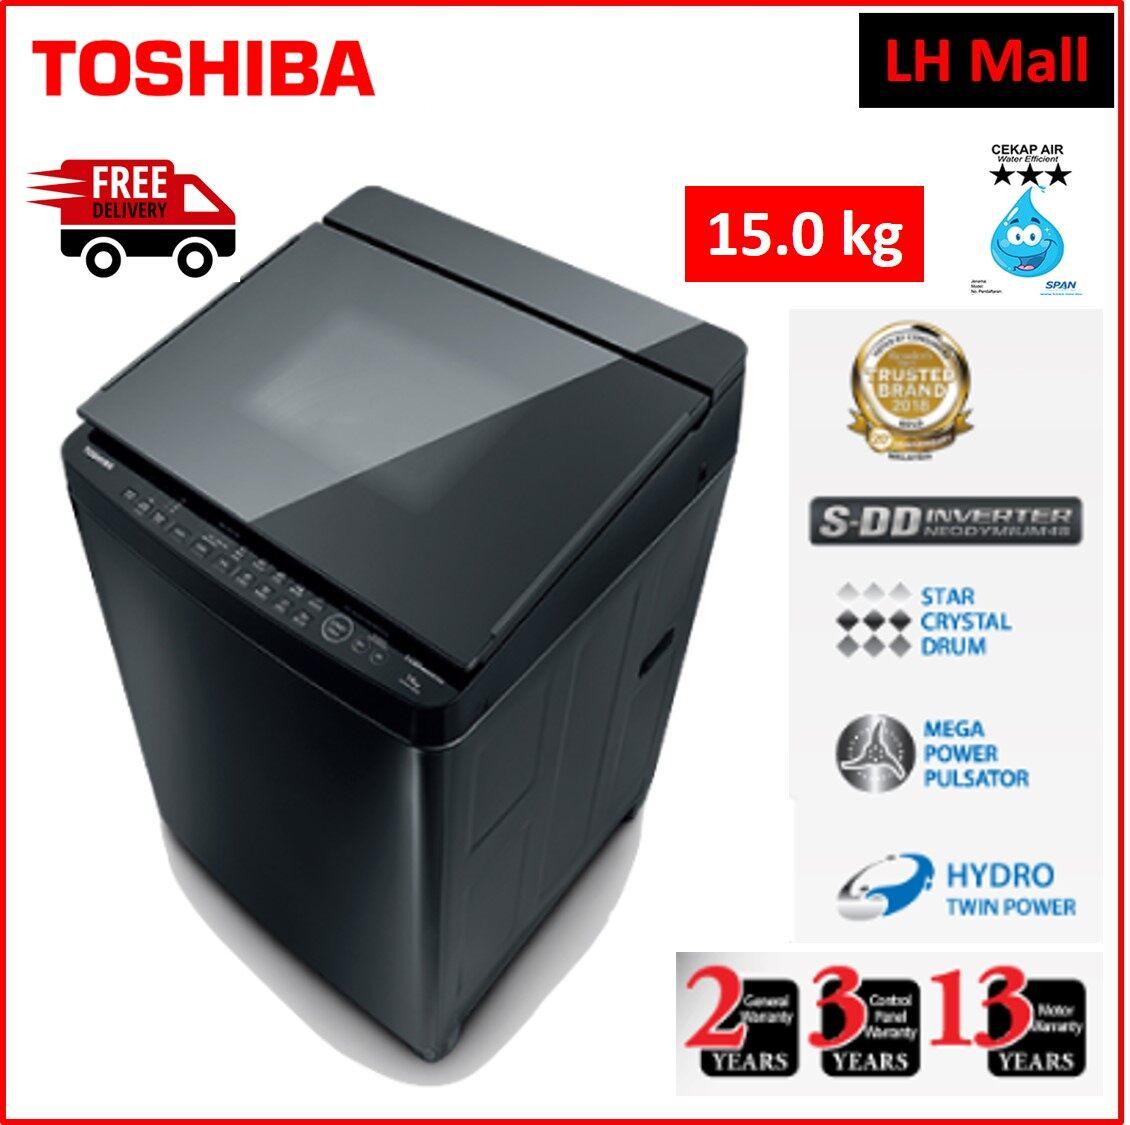 Toshiba Top Load AW-DG1600WM (SK) - 15kg SDD Inverter - Washing Machine Mesin Basuh